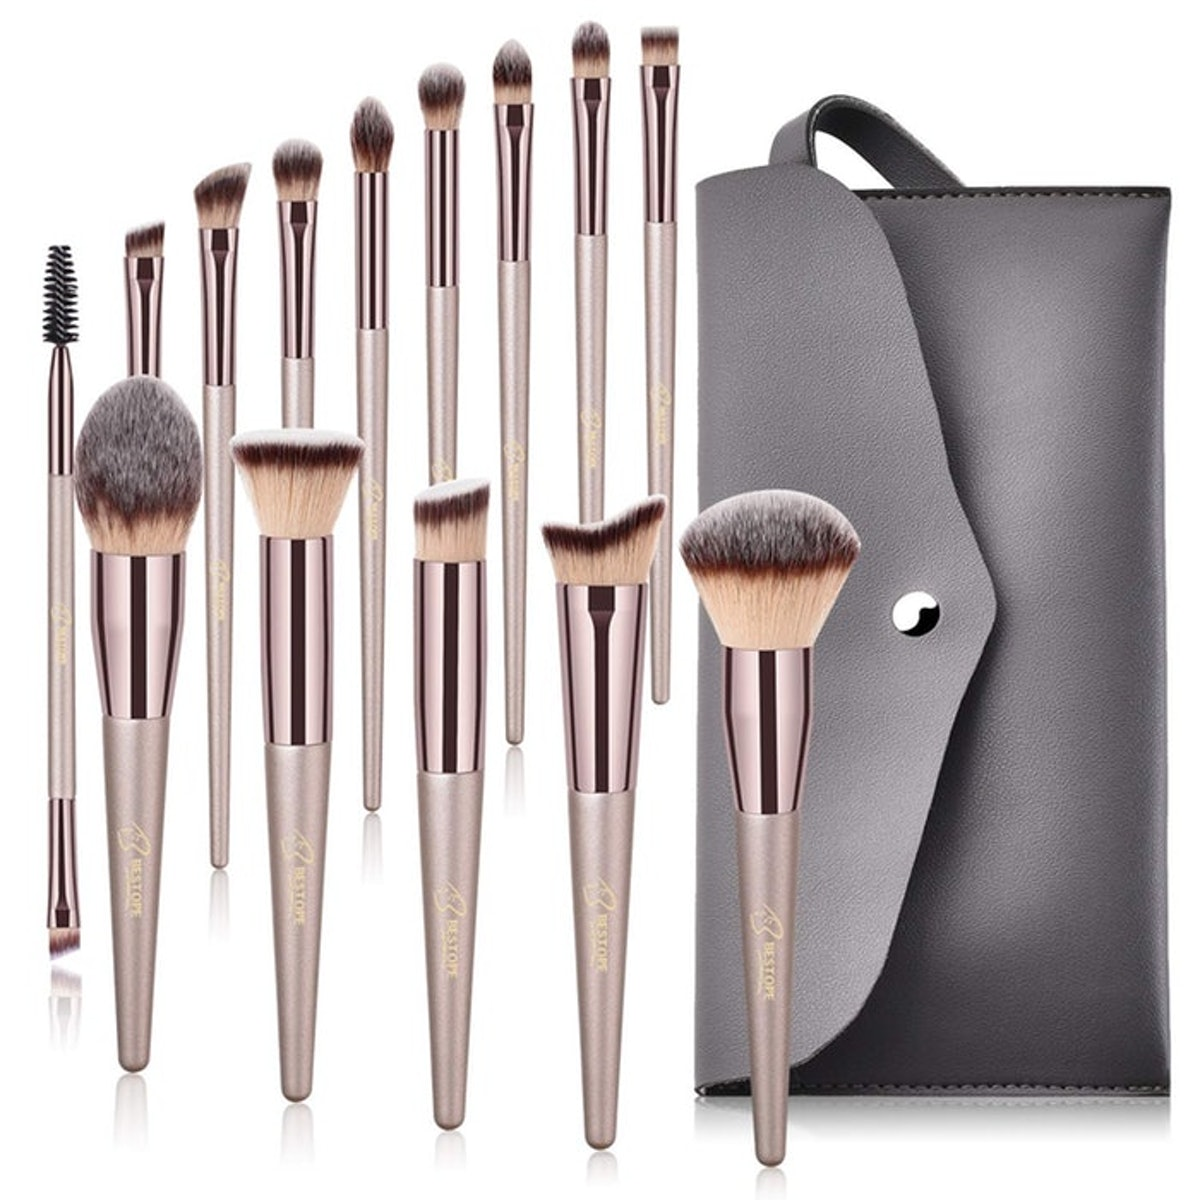 BESTOPE Makeup Brush Set (14 Pieces + Case)